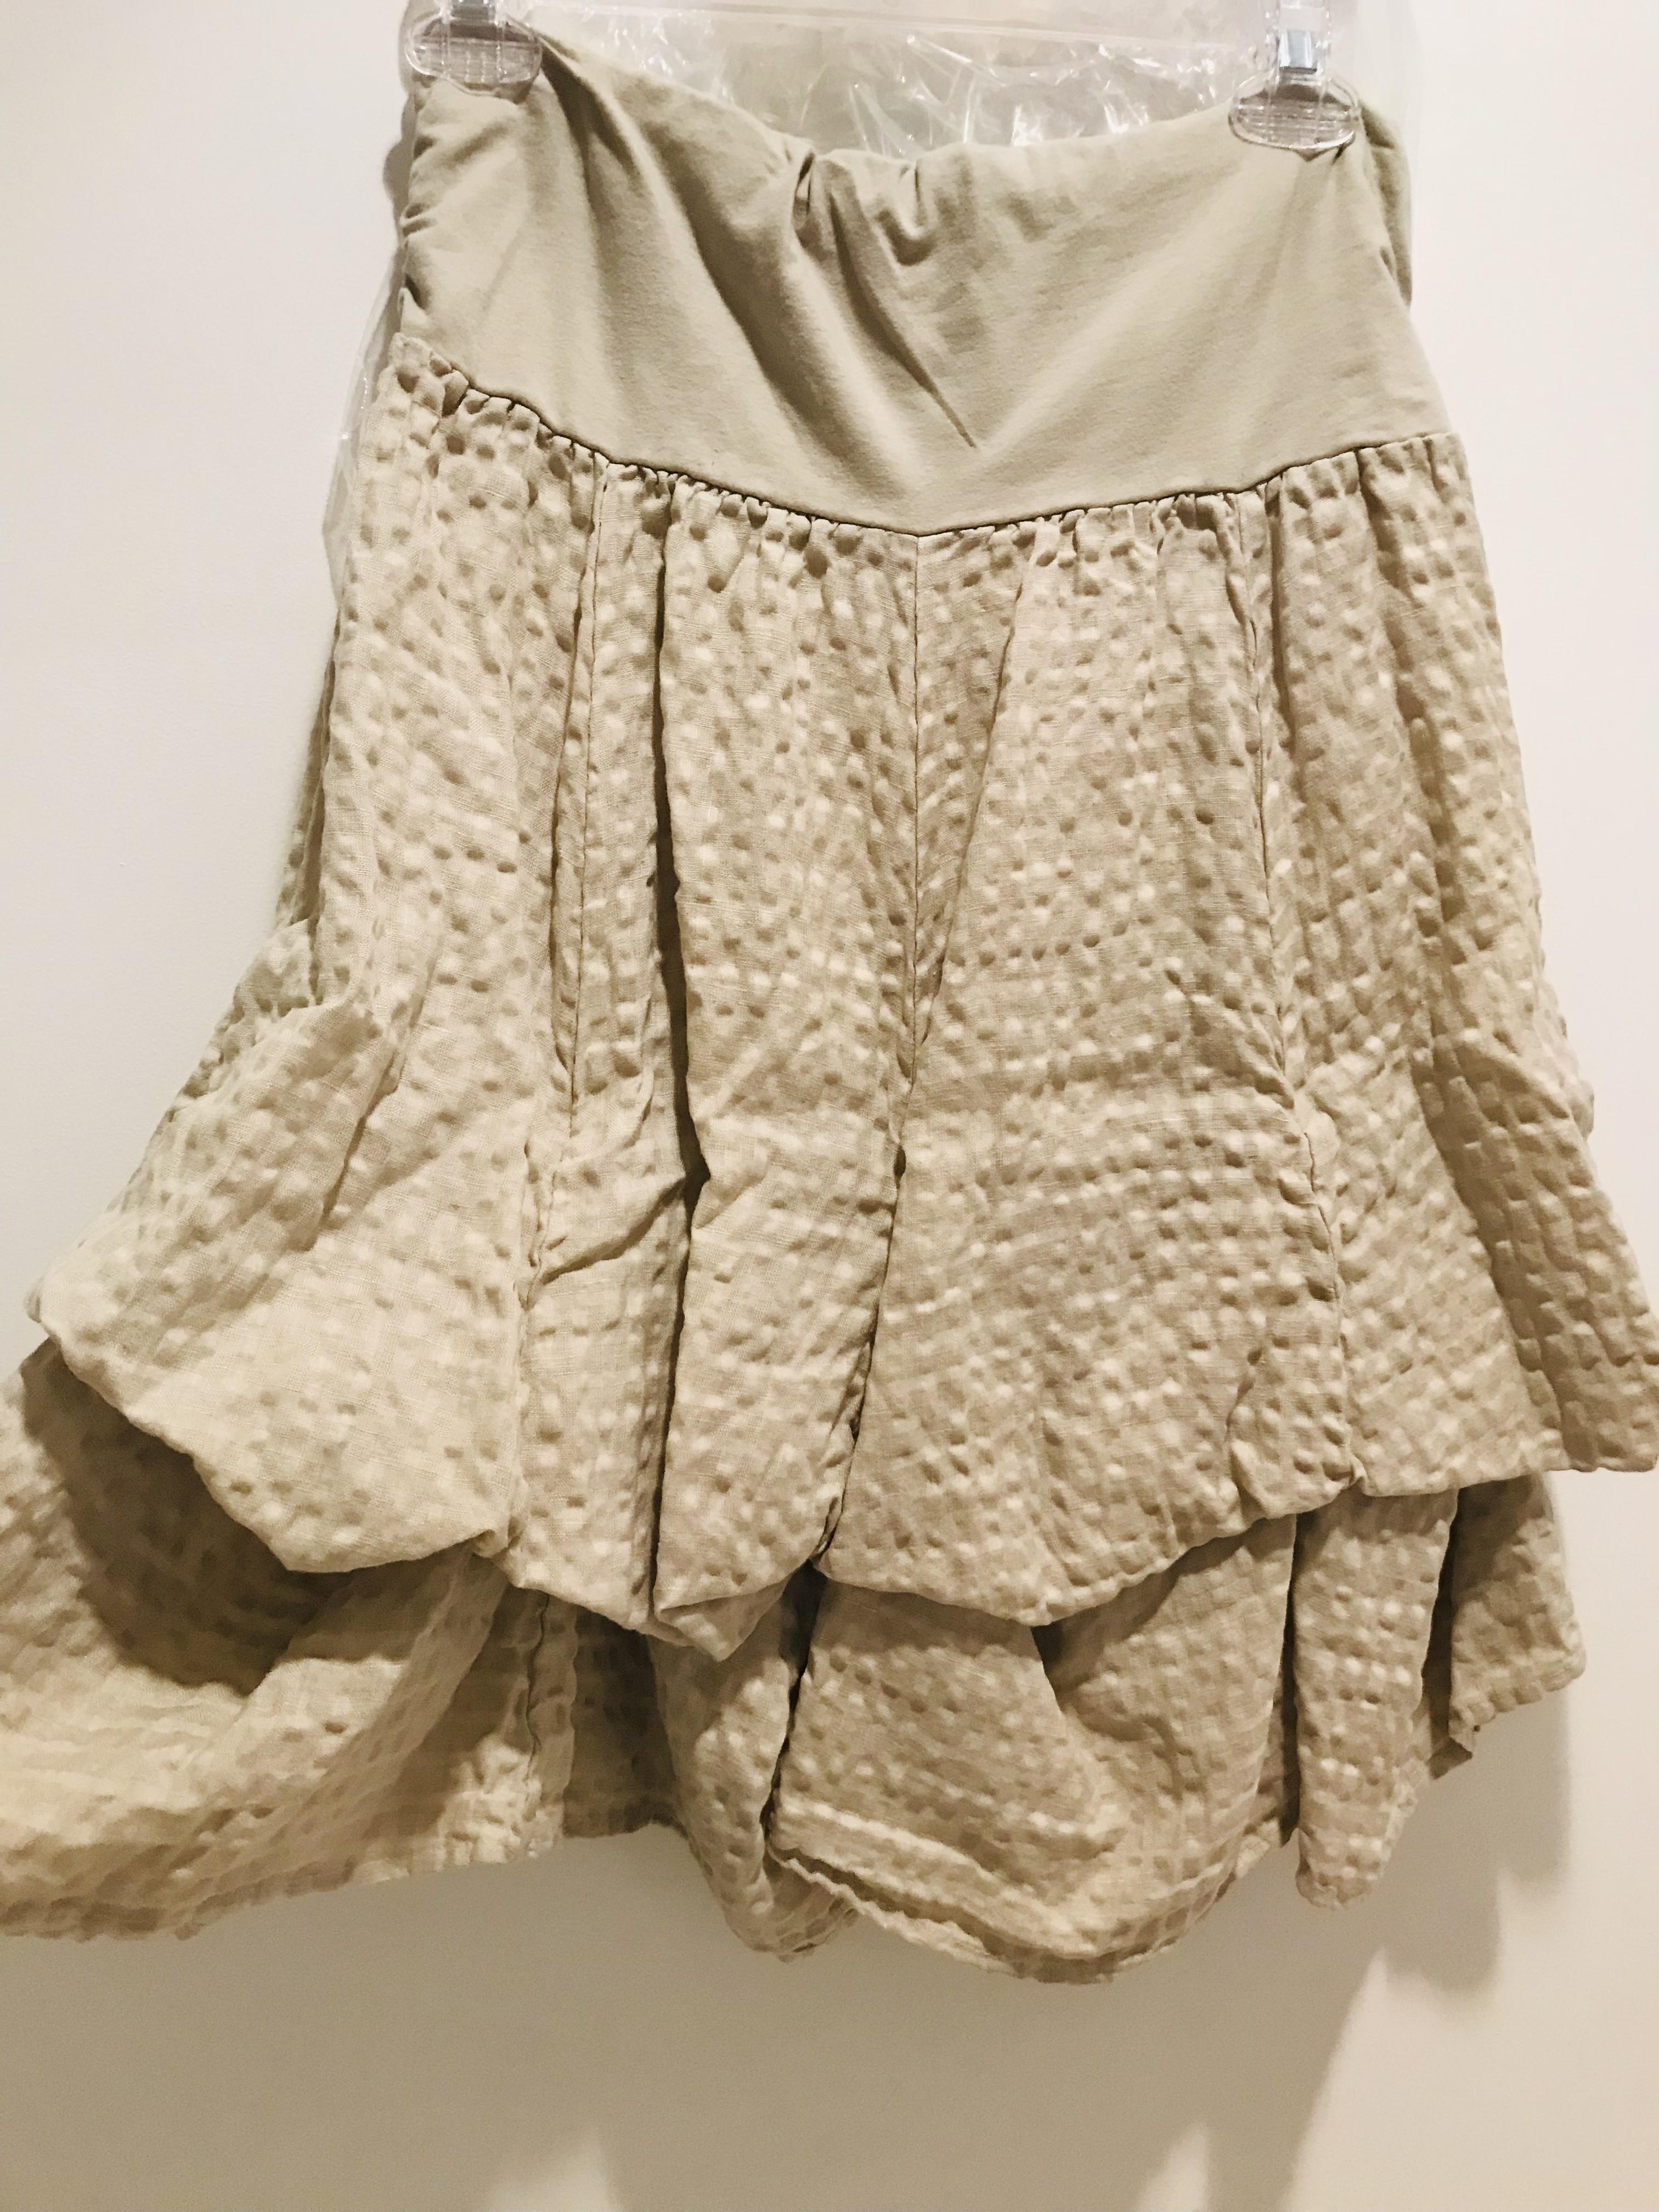 Luna Luz: Tied & Dyed Seersucker Cotton Skirt (In Khaki, Ships Immed!)